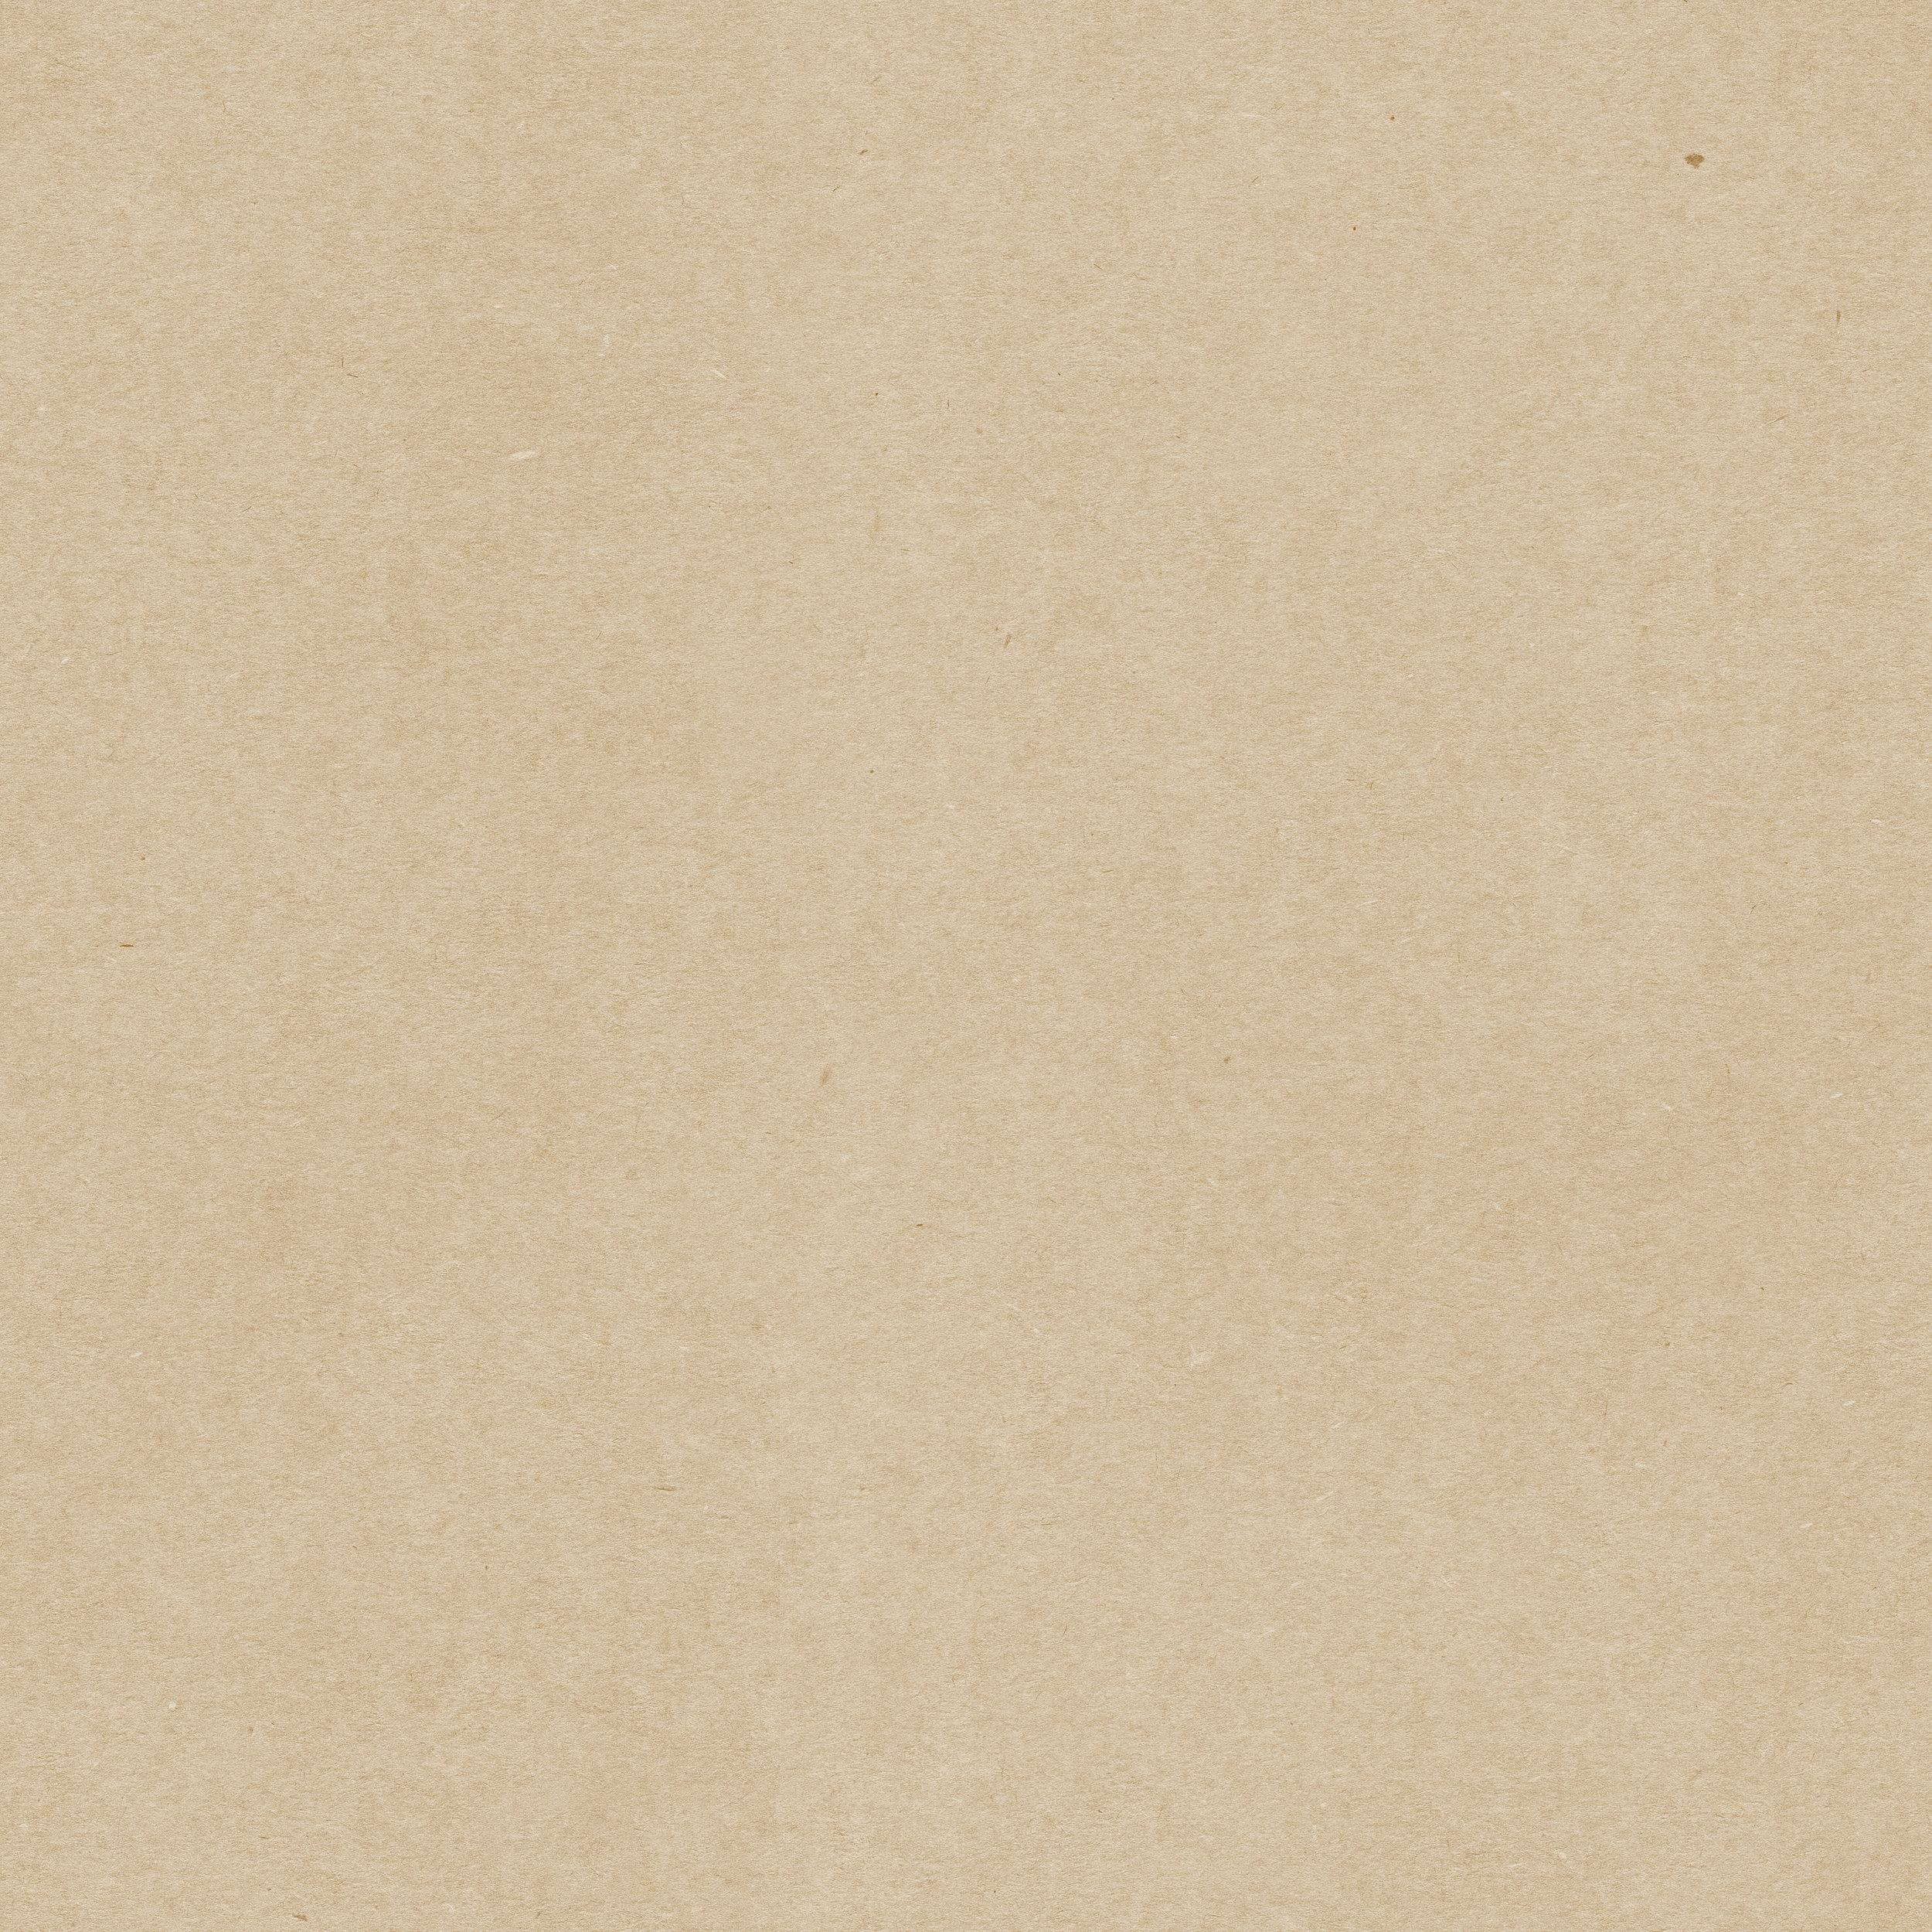 Natural Kraft Paper Textures by Avenie Digital_11.jpg